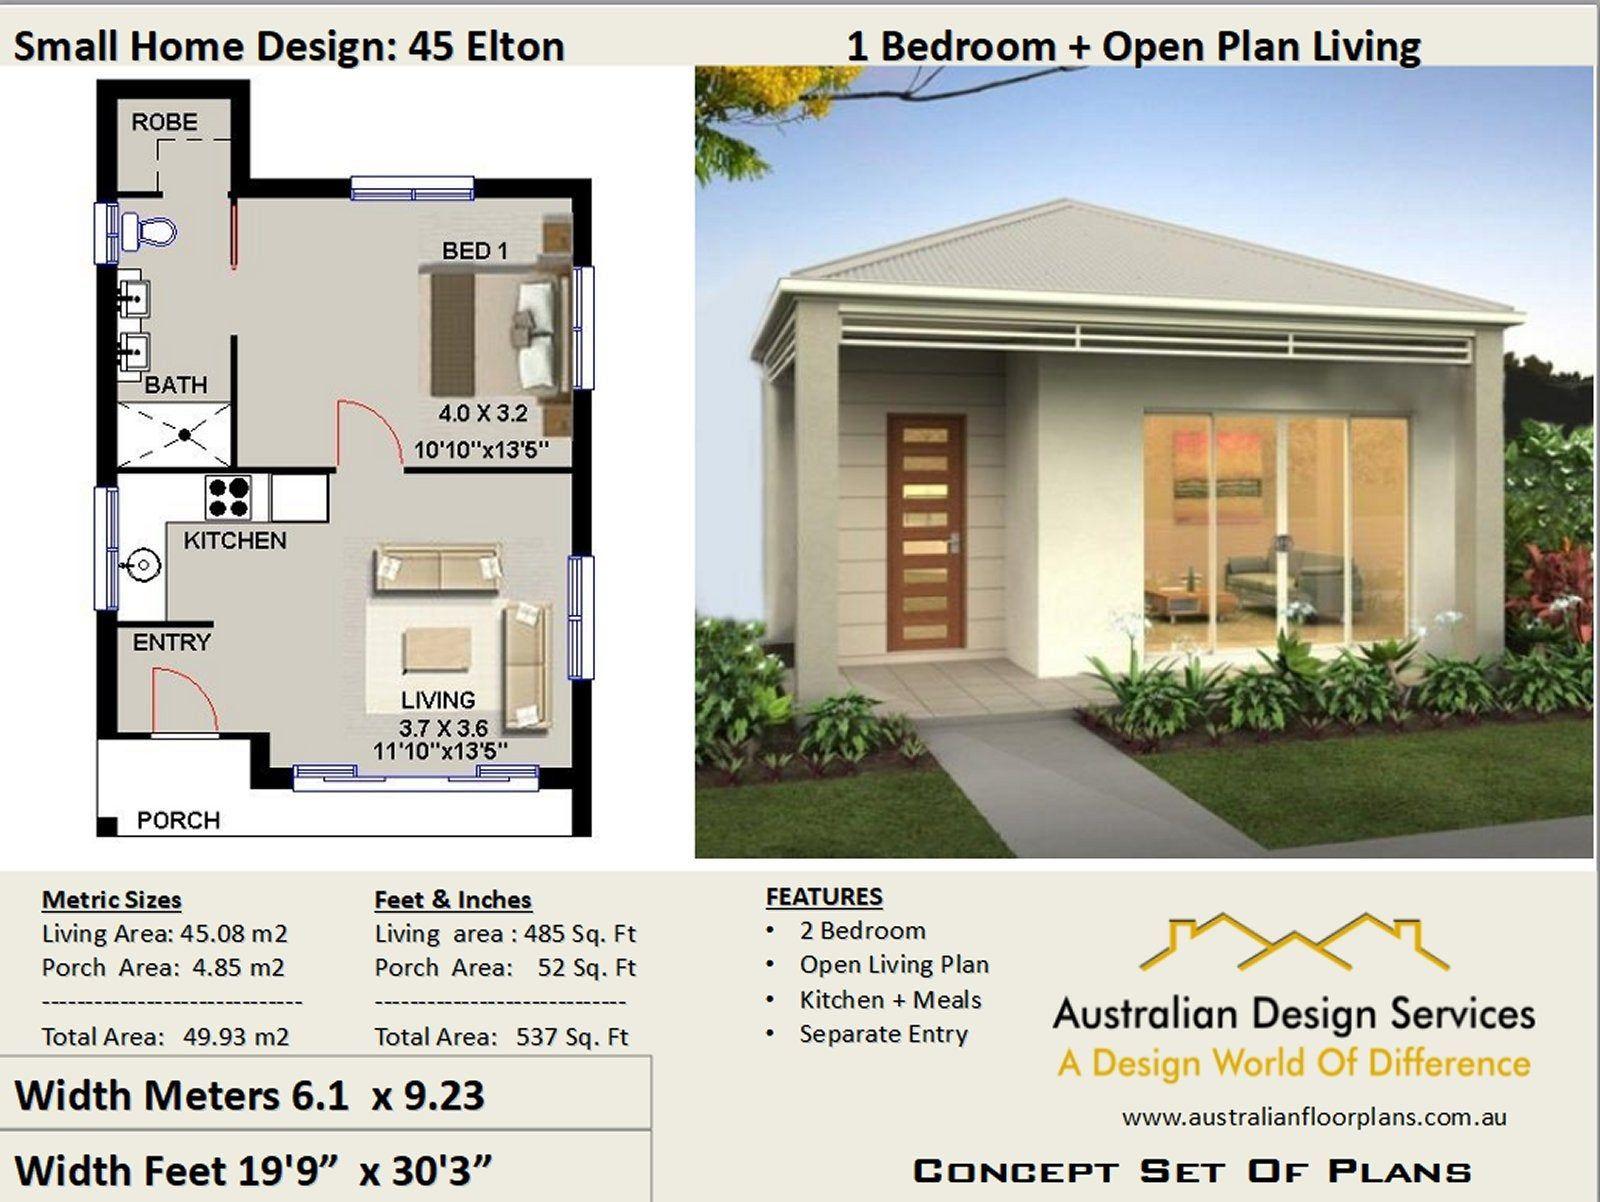 Small House Plan 45 Elton 537 Sq Foot 45 93 M2 1 Bedroom Etsy Small House Design One Bedroom House House Plans For Sale